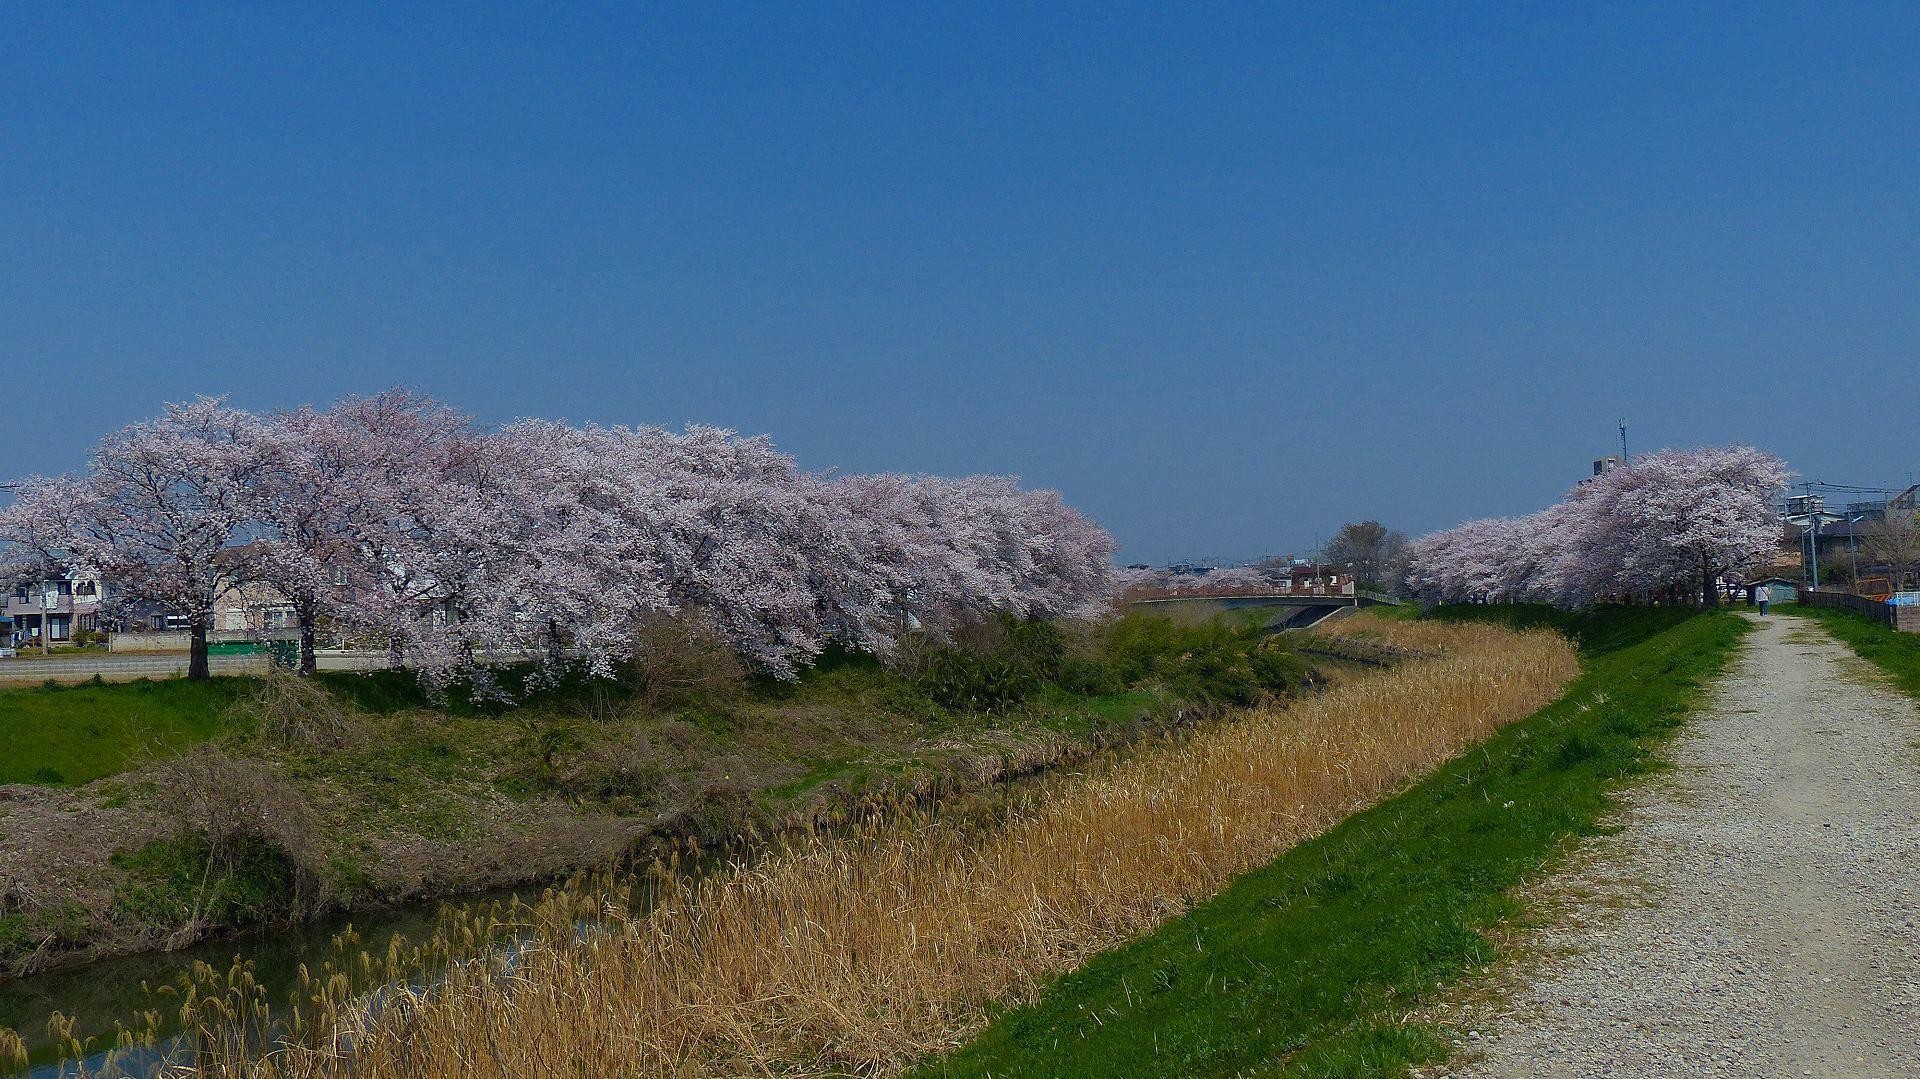 満開の桜を堪能! 【 2018 3/28(水) 】_a0185081_19280377.jpg